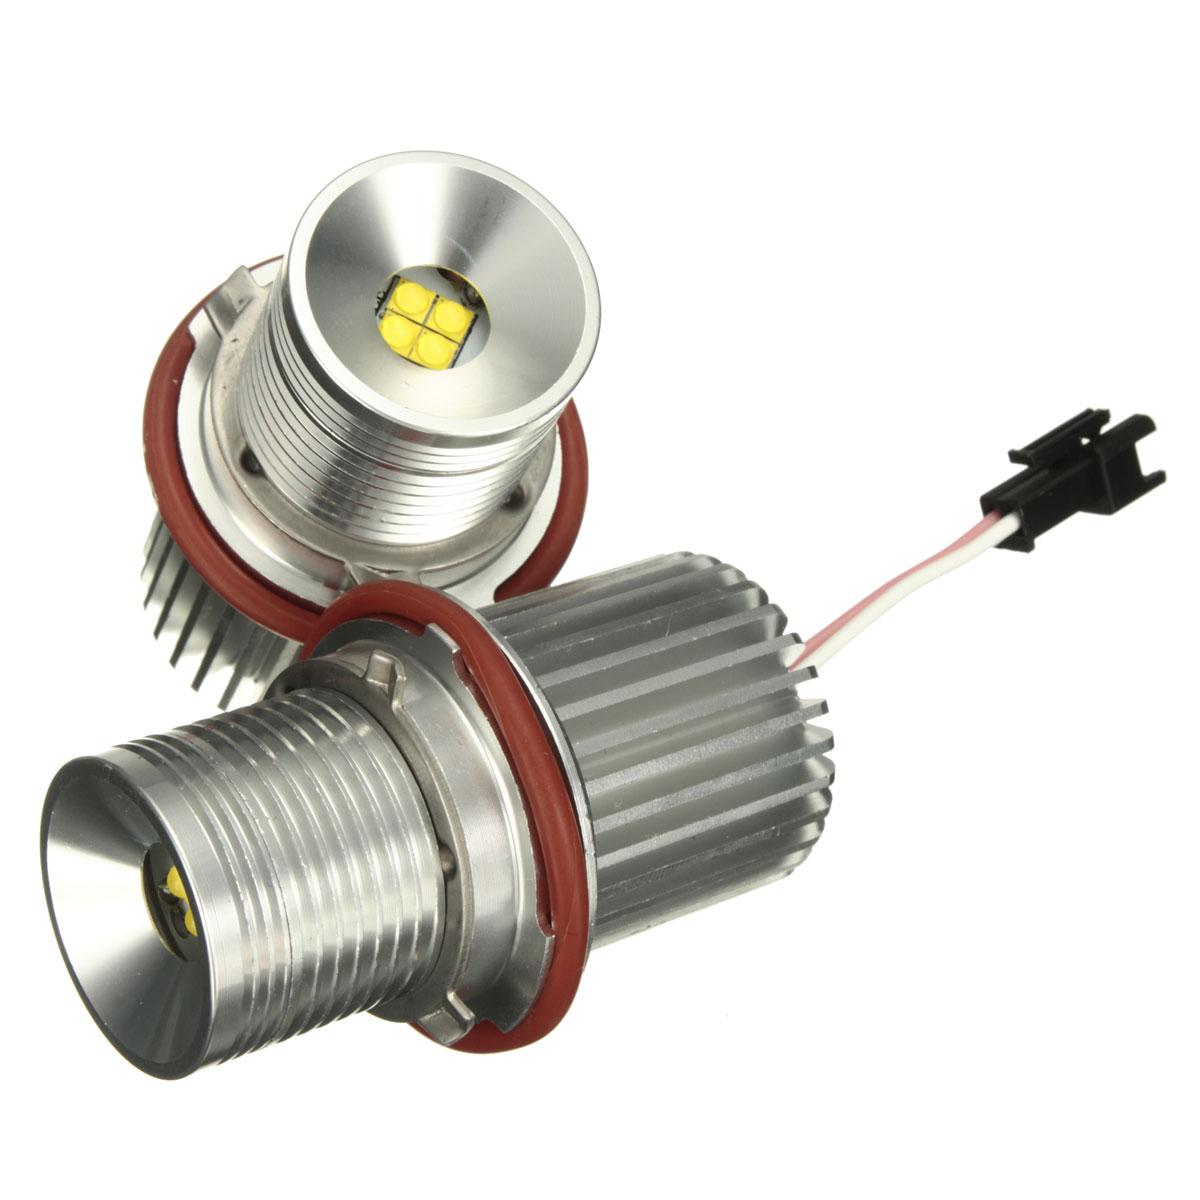 1Pair 40W Car LED Angel Eyes Marker Halo RING Light Lamp H8 Bulb For BMW E39 E60 E61 E65 E66 E83 E87 63126904048